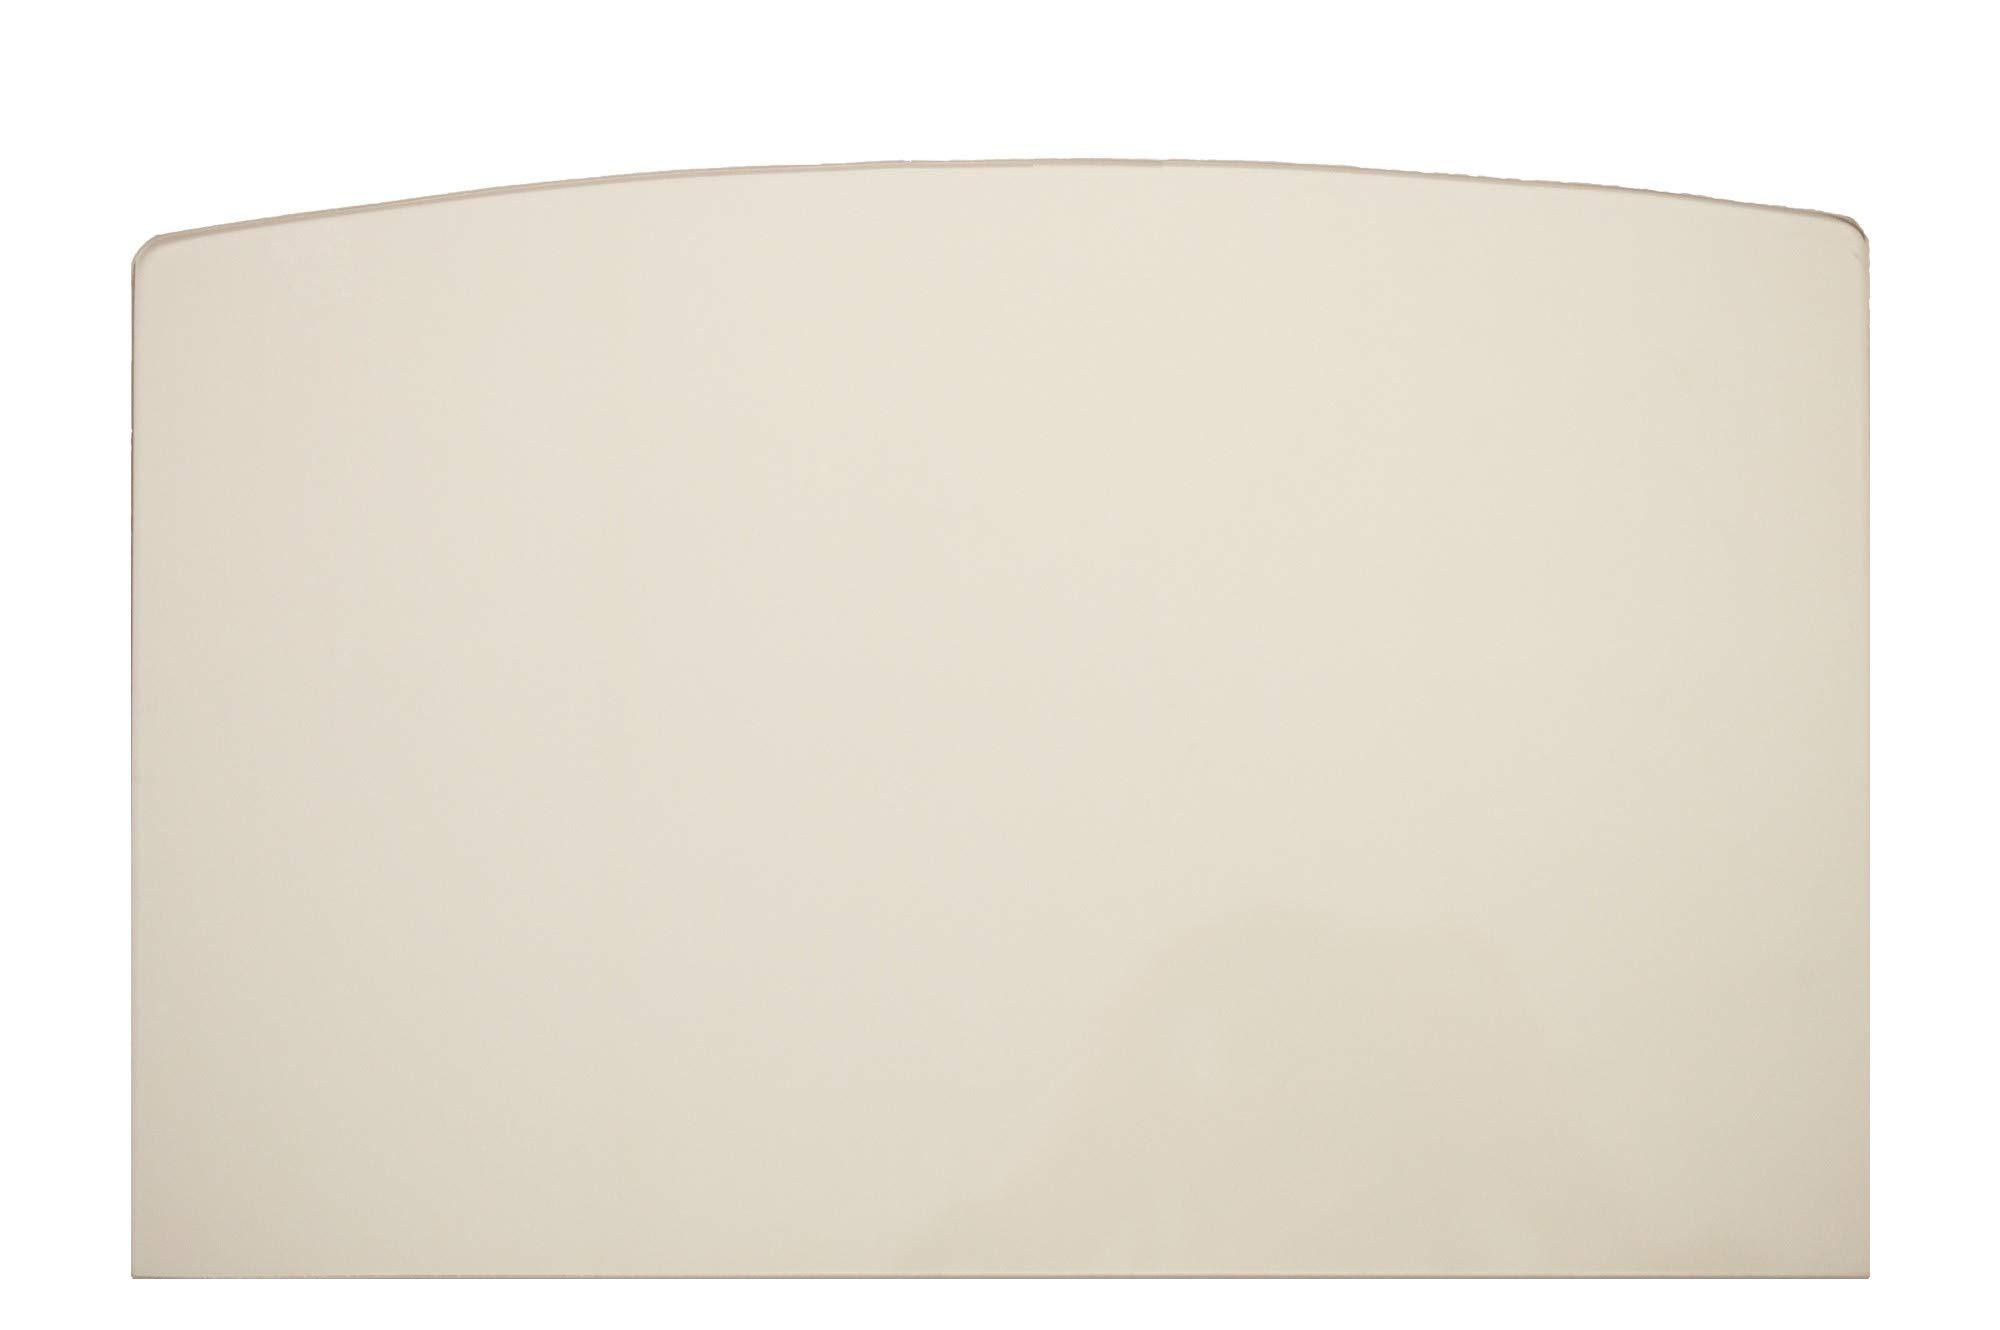 Buck Stove Model 26, 51, 74/74zc, 80/80zc, 91, 94NC Glass by Generic